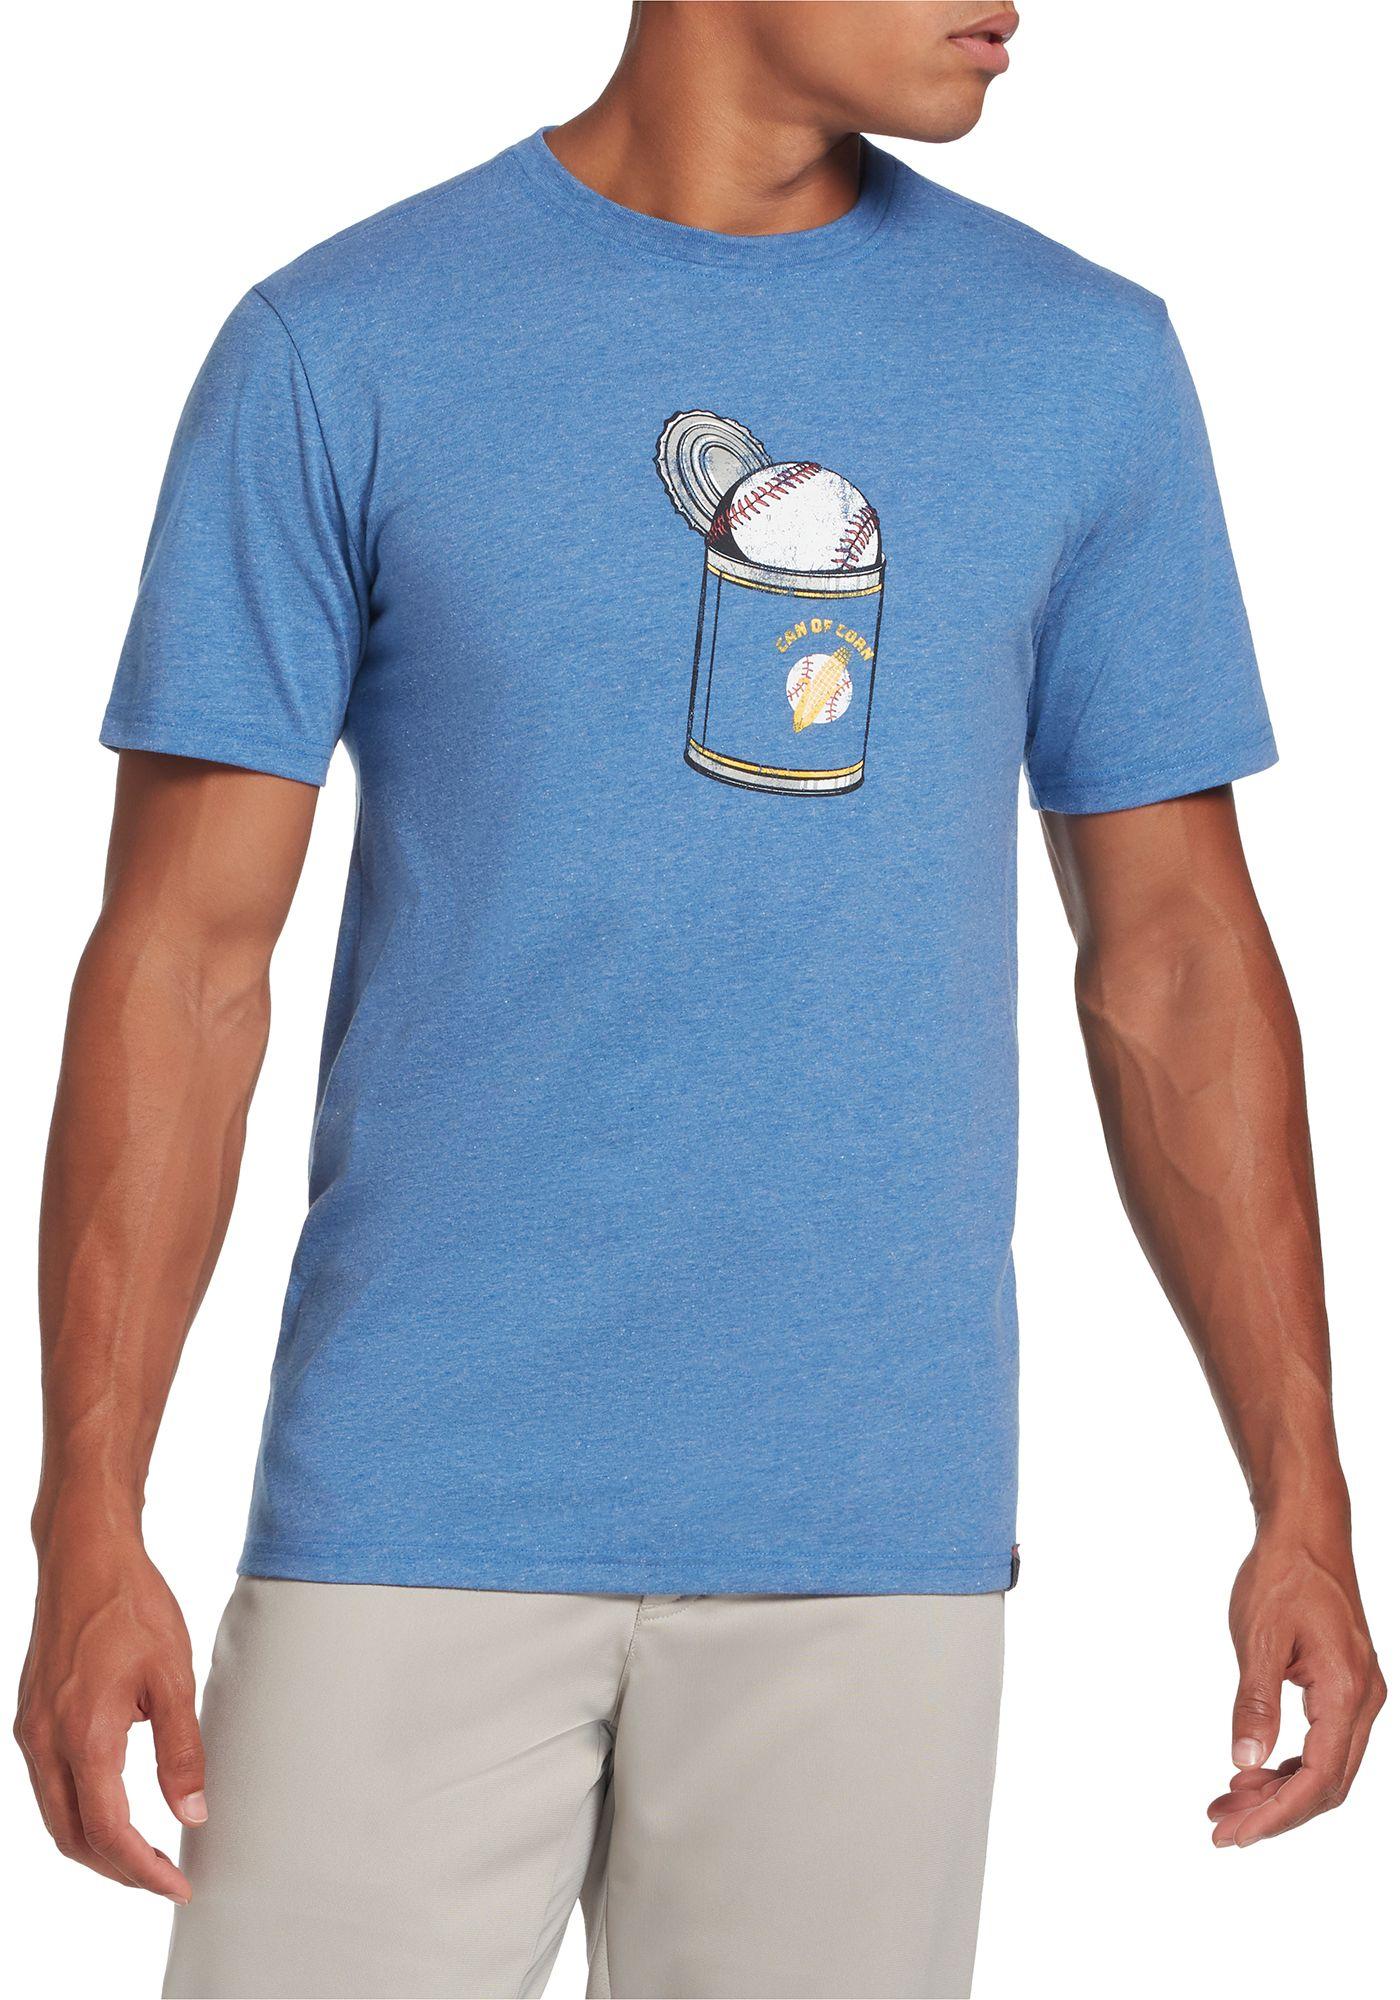 DICK'S Sporting Goods Men's Ball Park Series Baseball Graphic T-Shirt